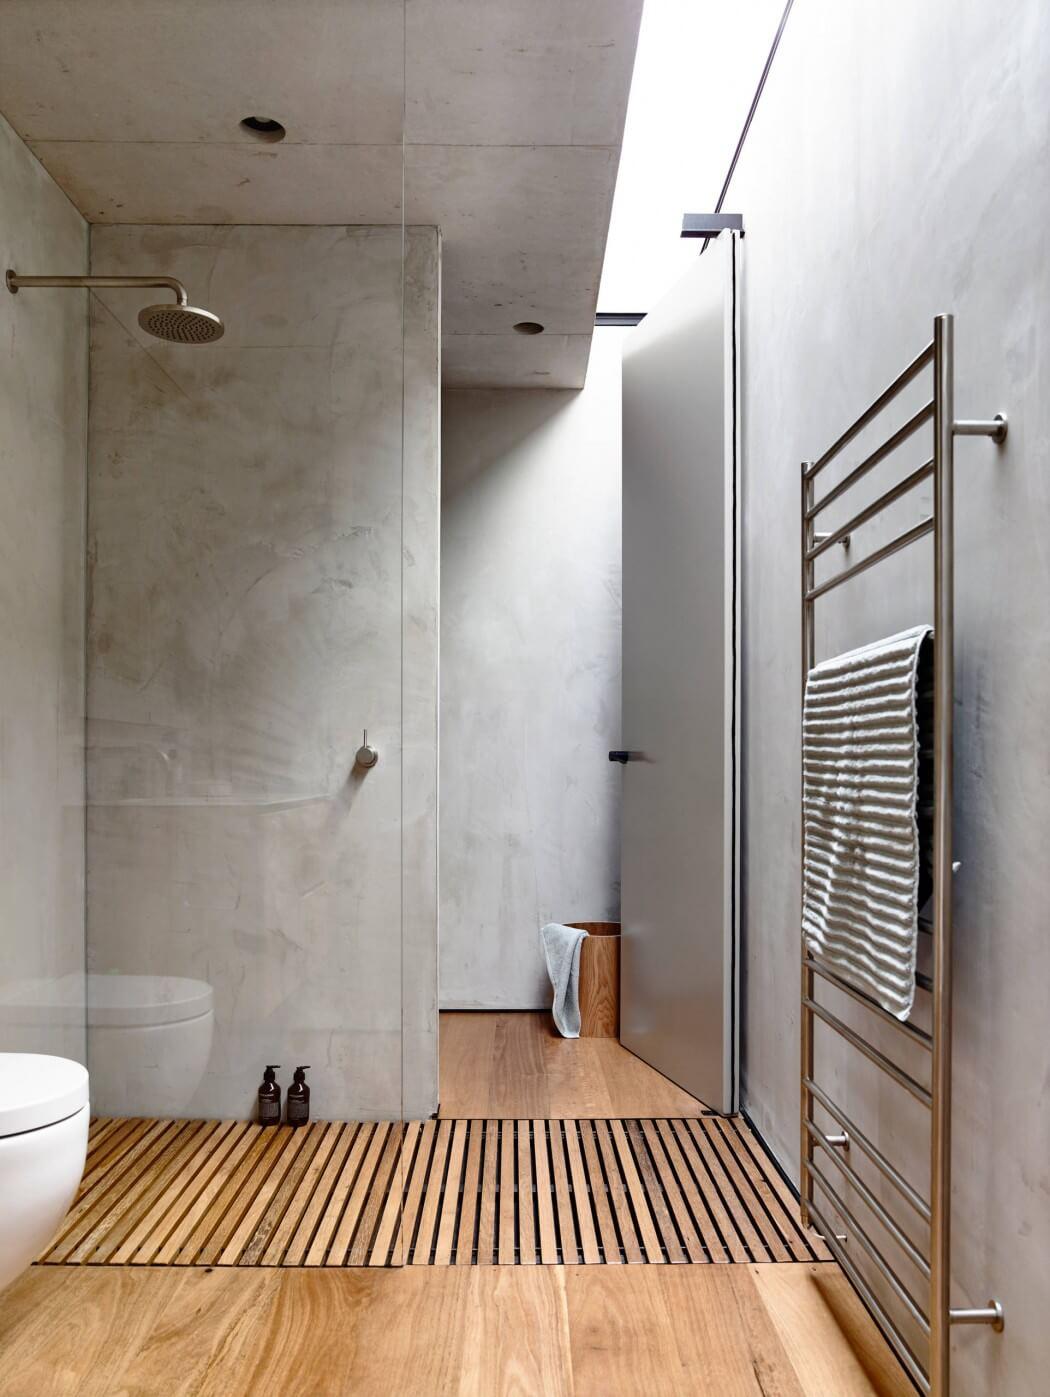 Open badkamer in slaapkamer ~ [spscents.com]